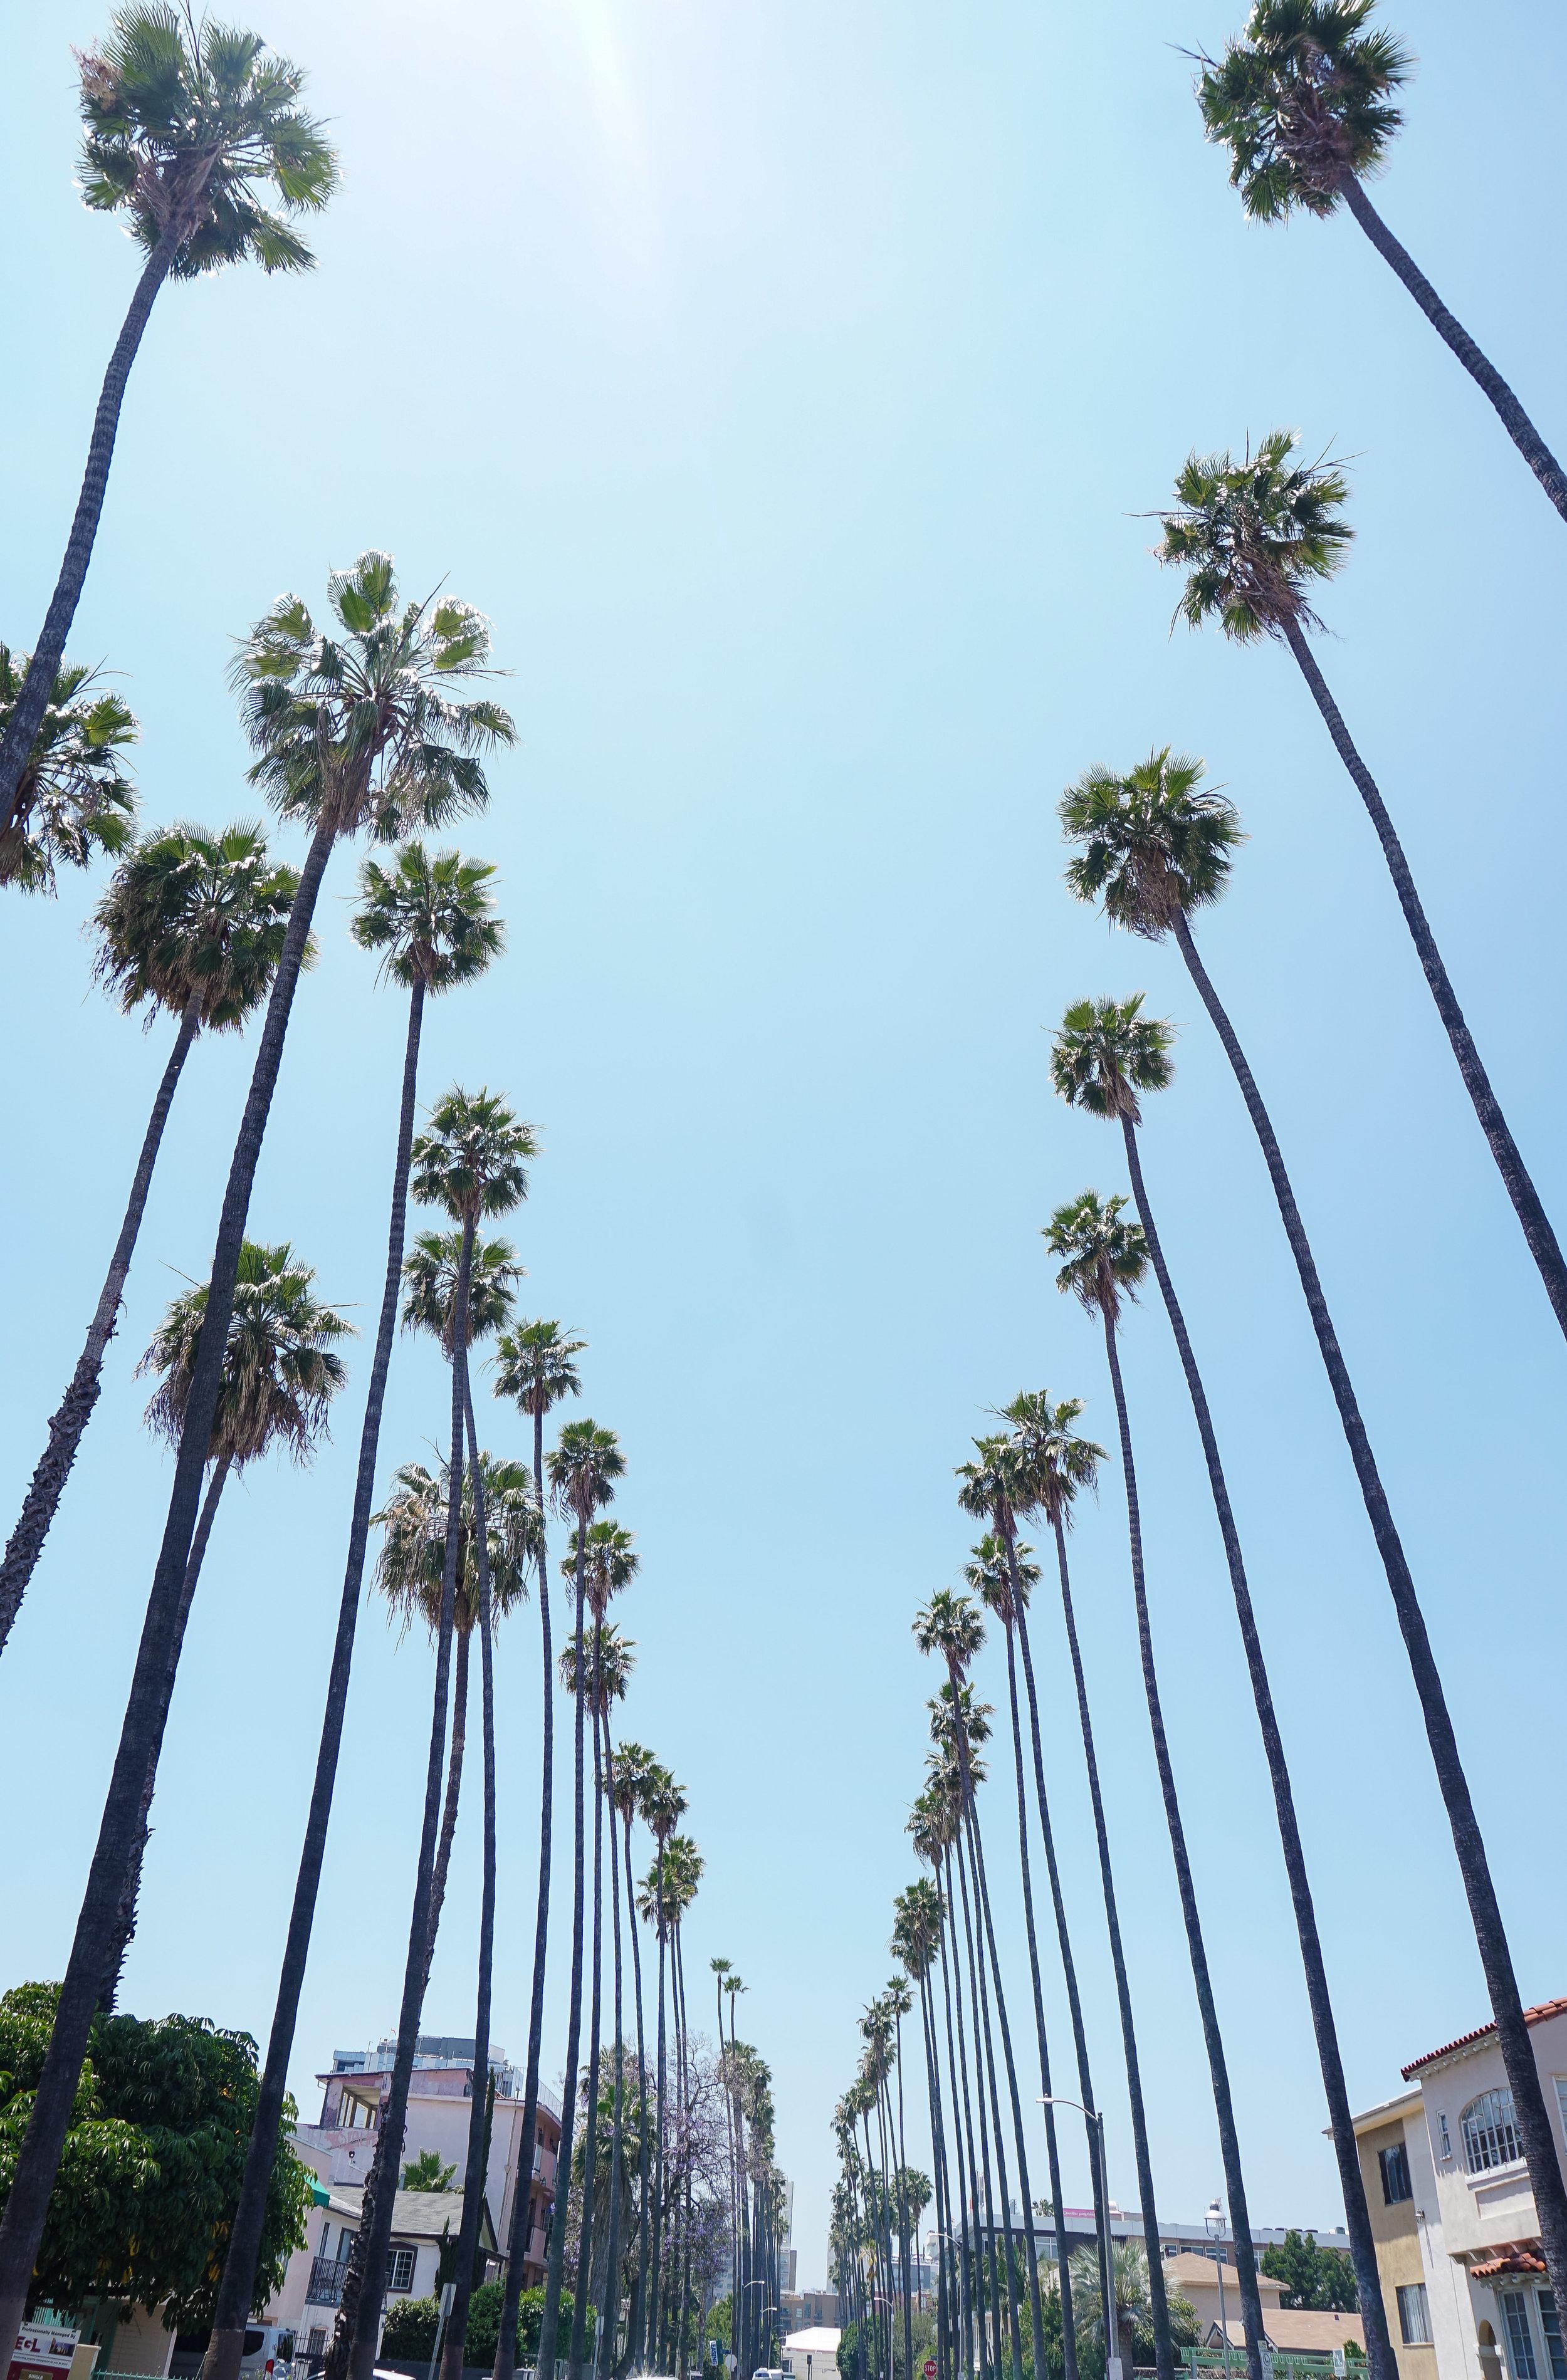 curio.trips.usa.california.los.angeles.palm.tree.street.portrait.jpg